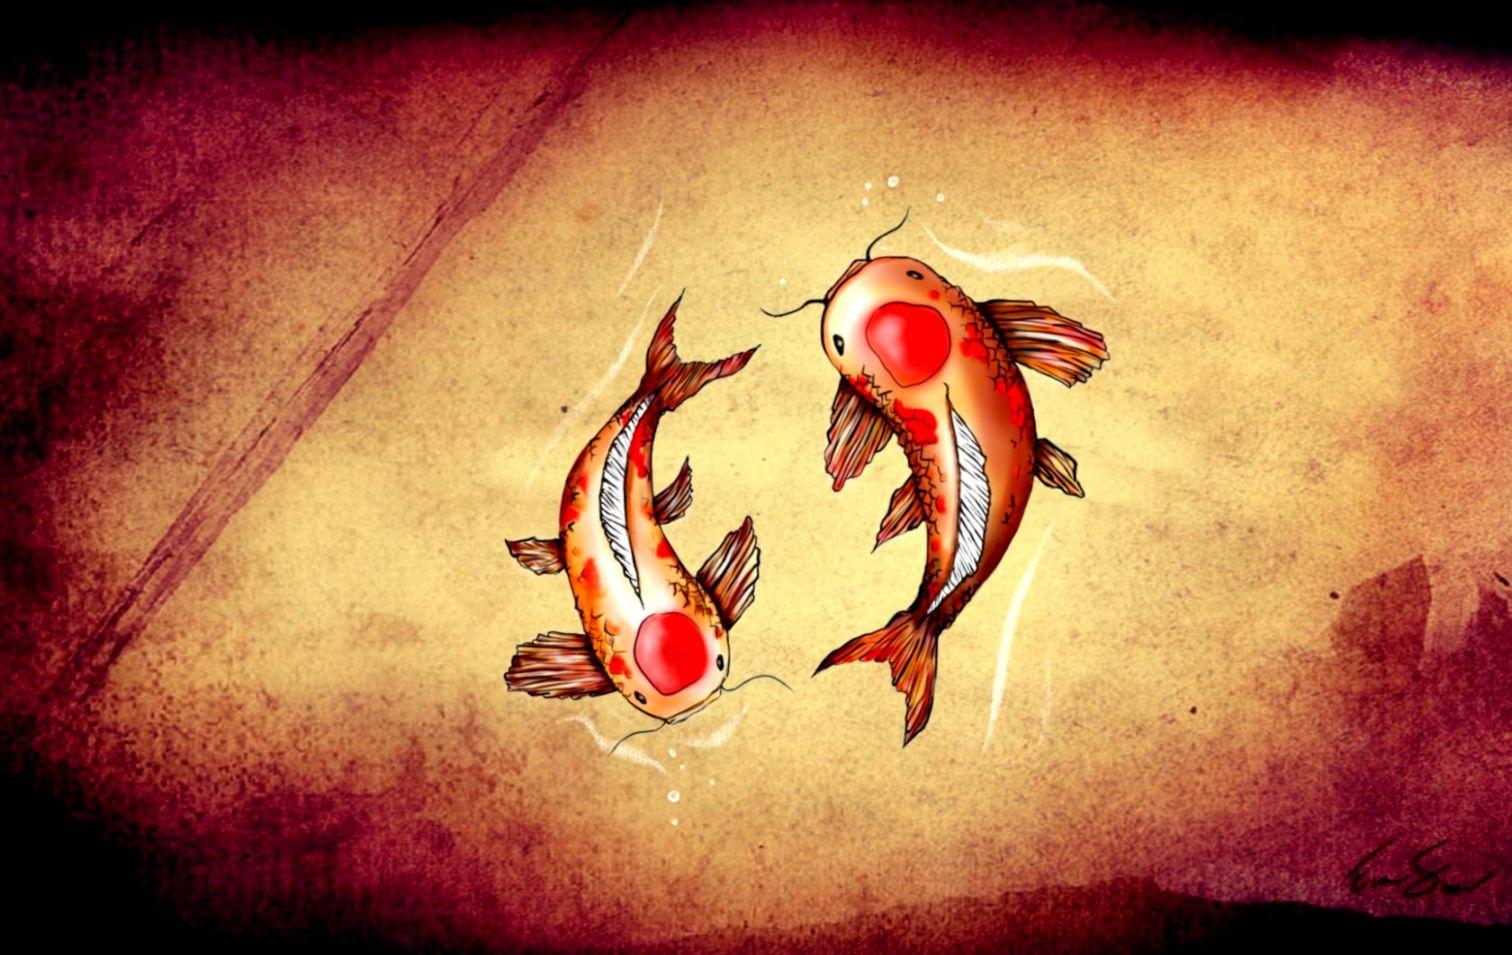 Drawing Koi Fish Art Hd Wallpaper Wallpapers Awards